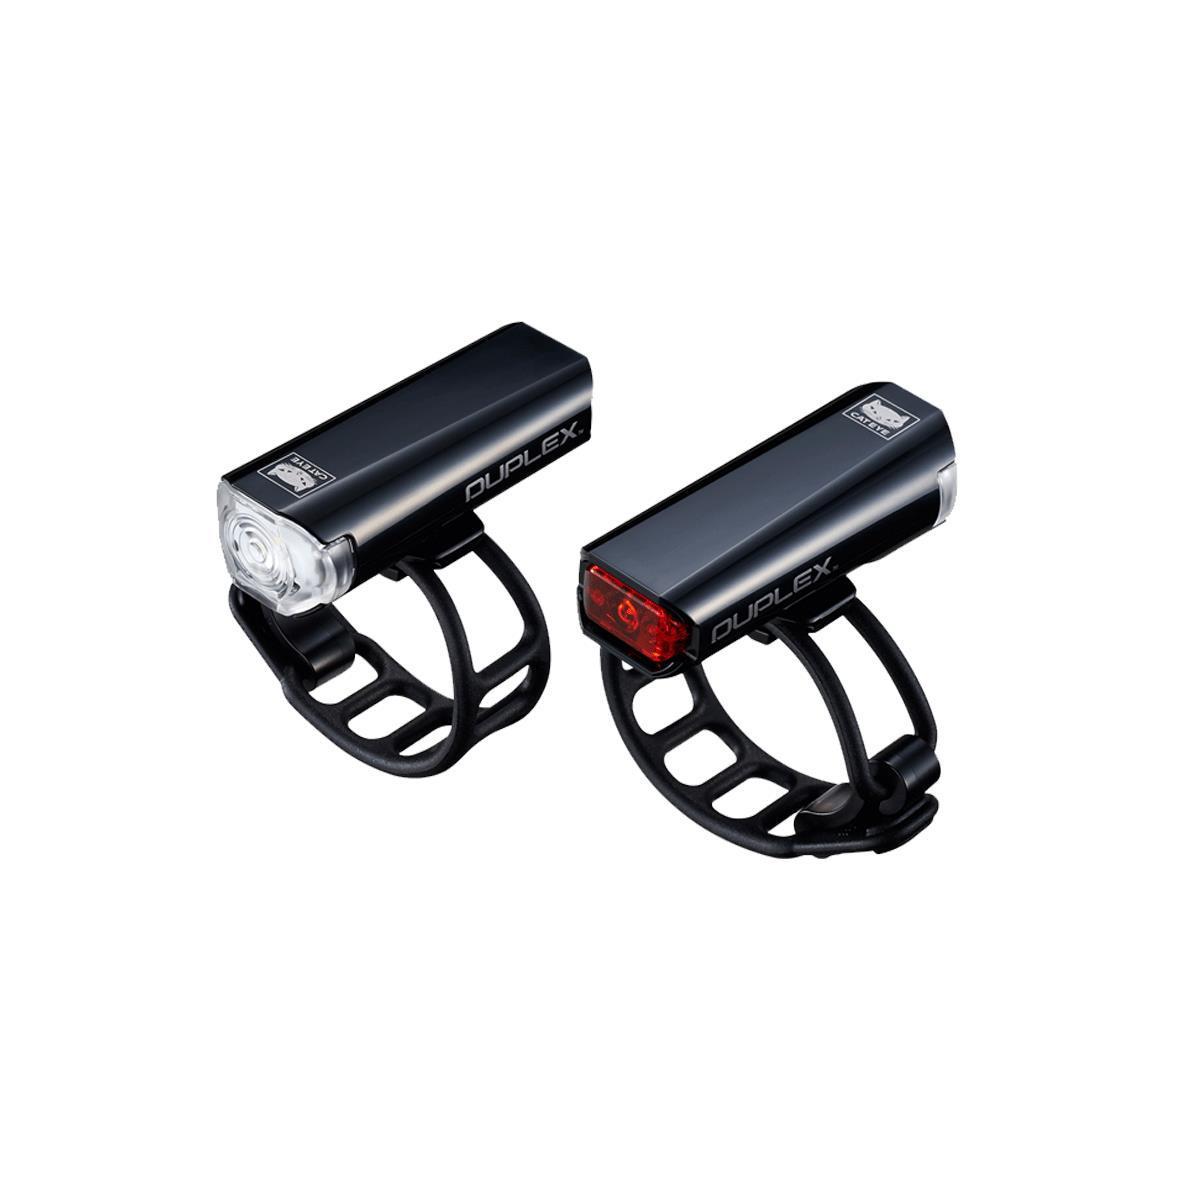 Lezyne Femto Drive Duo Front /& Rear Bike Bicycle Helmet Light Black RRP£24.99